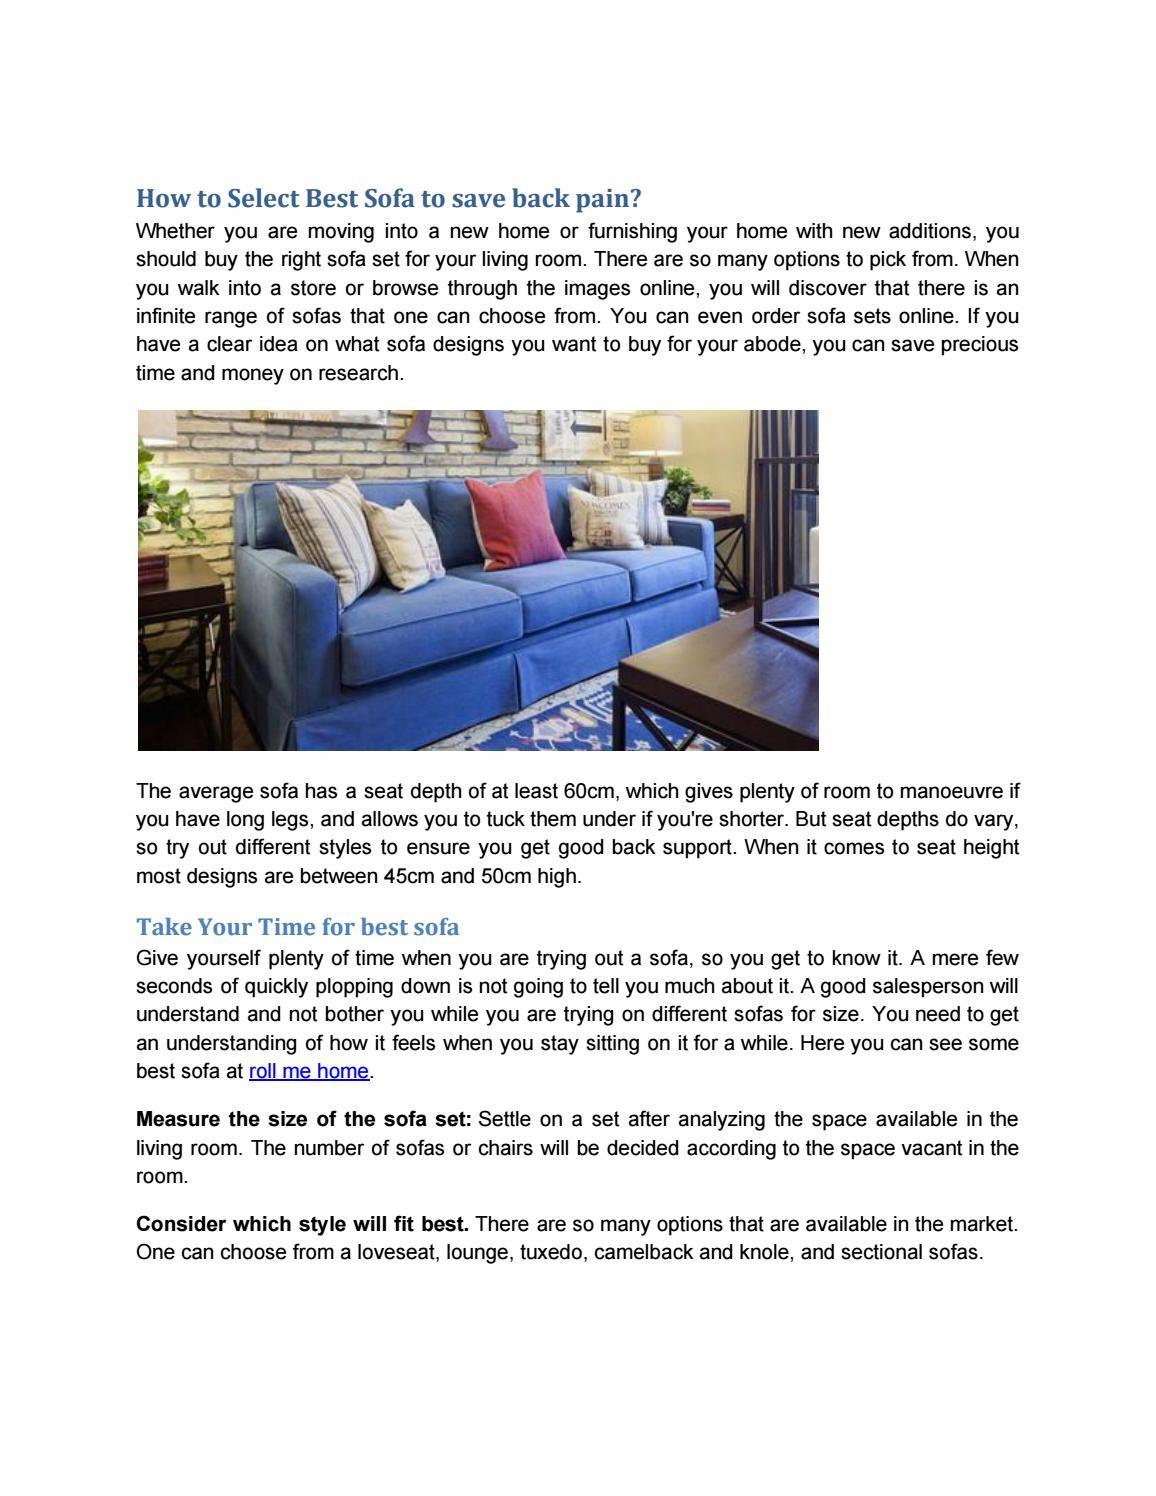 Enjoyable How To Select Best Sofa To Save Back Pain By David Wilson Customarchery Wood Chair Design Ideas Customarcherynet